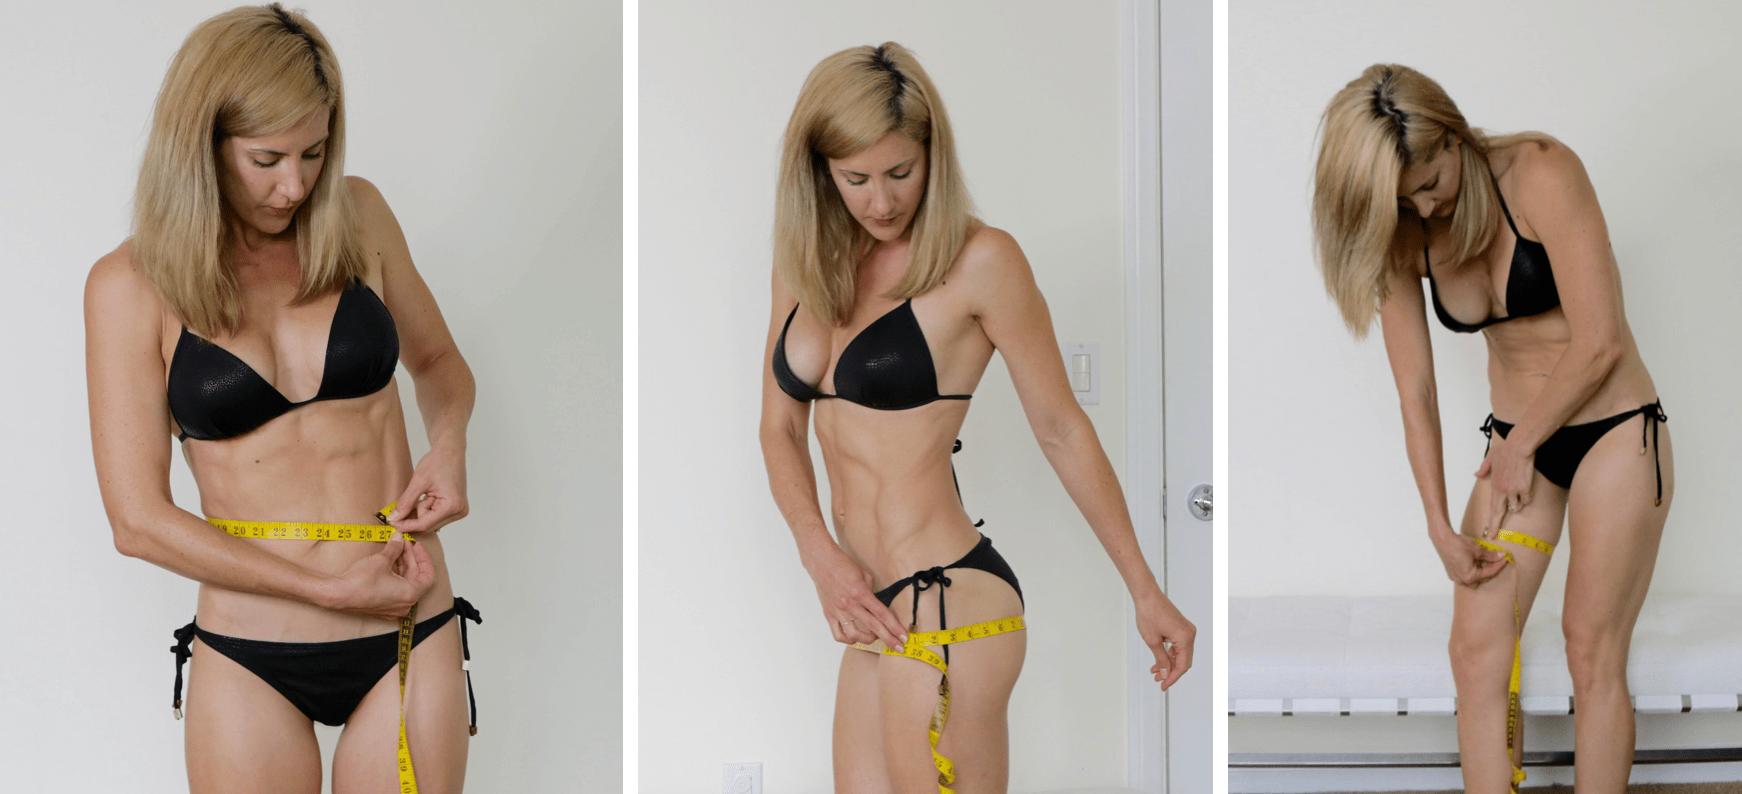 how to measure waist